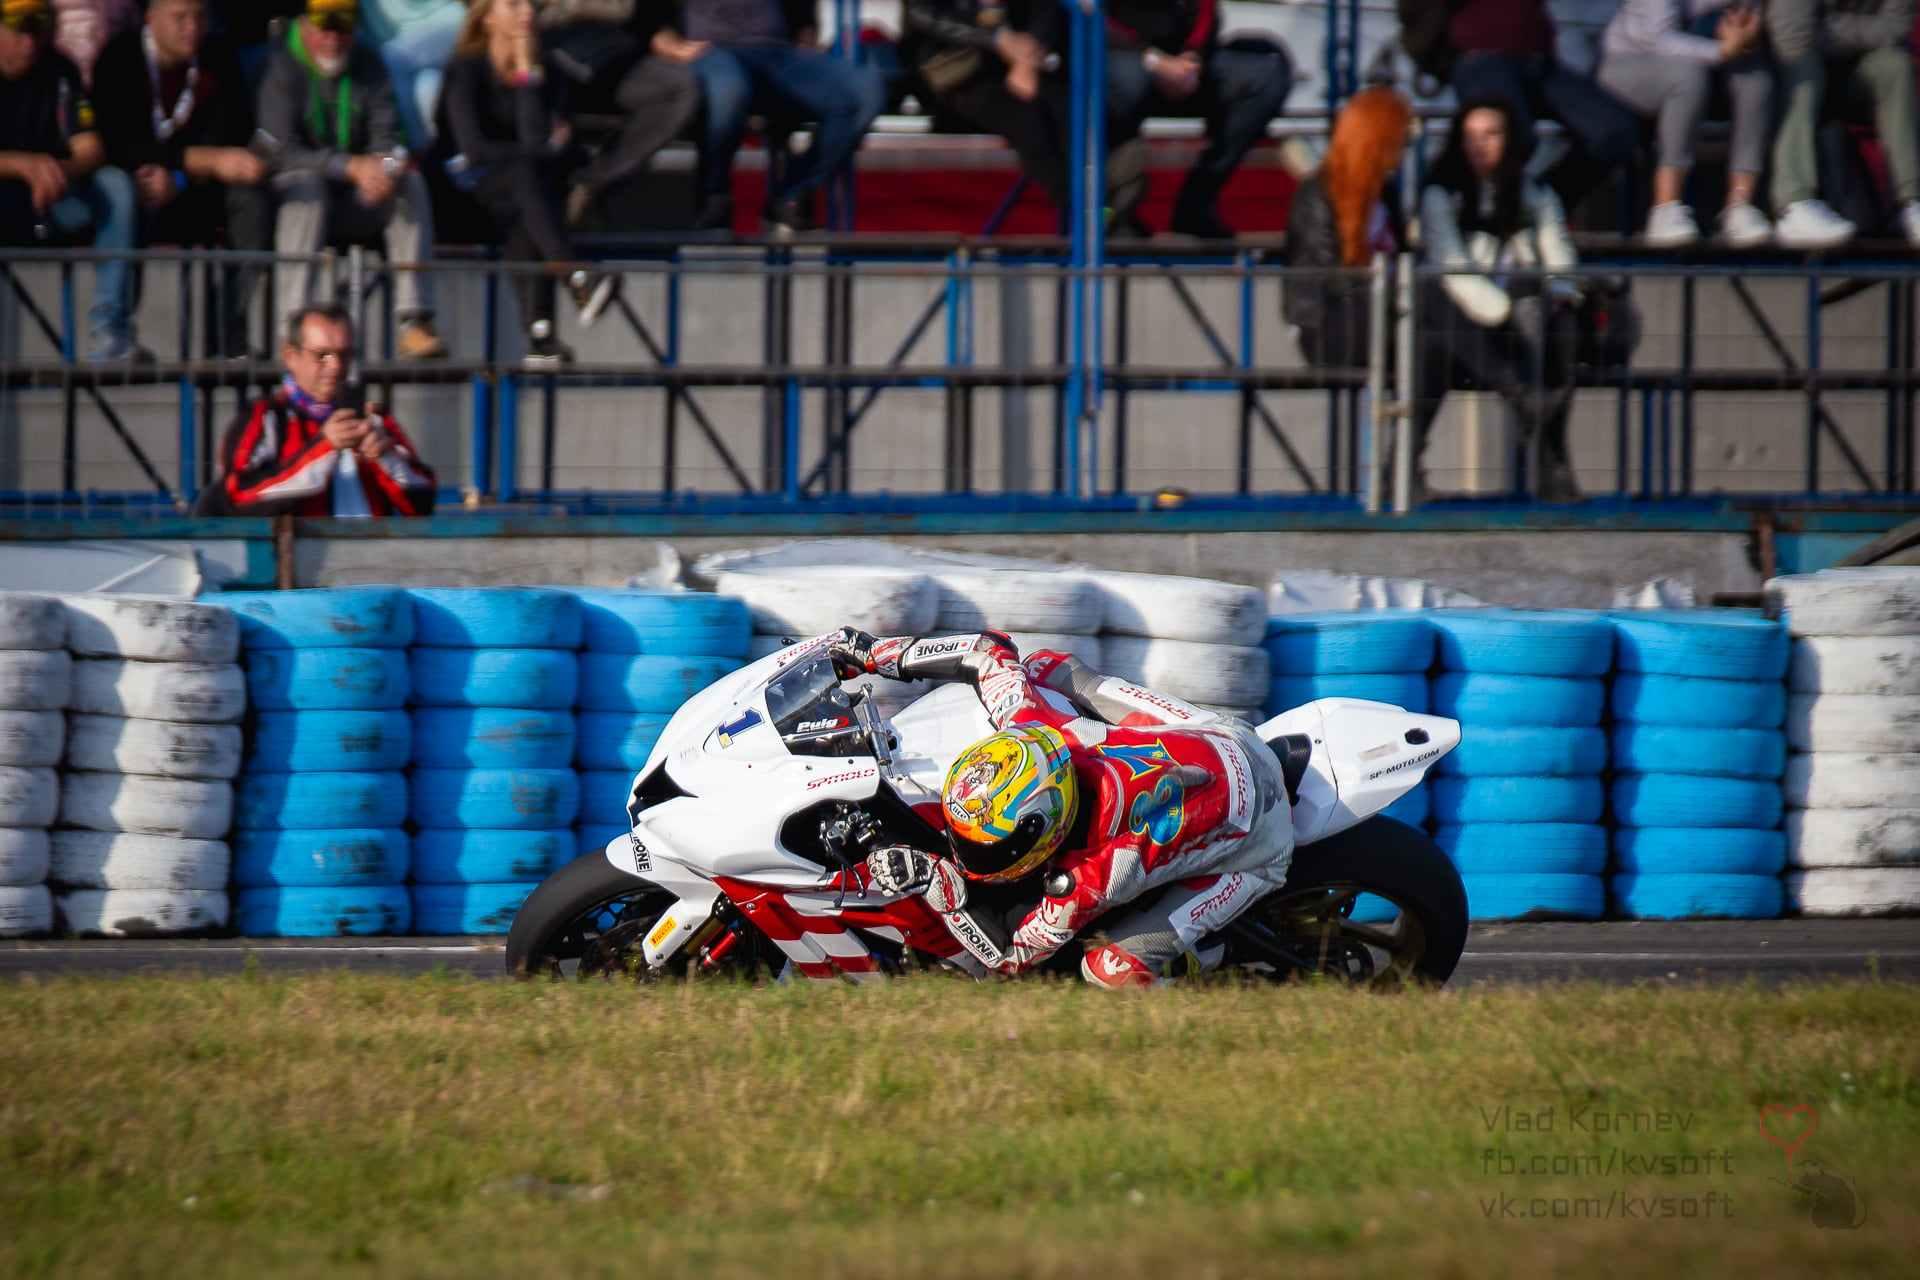 5-6_etap_MotoGPUkraine_124